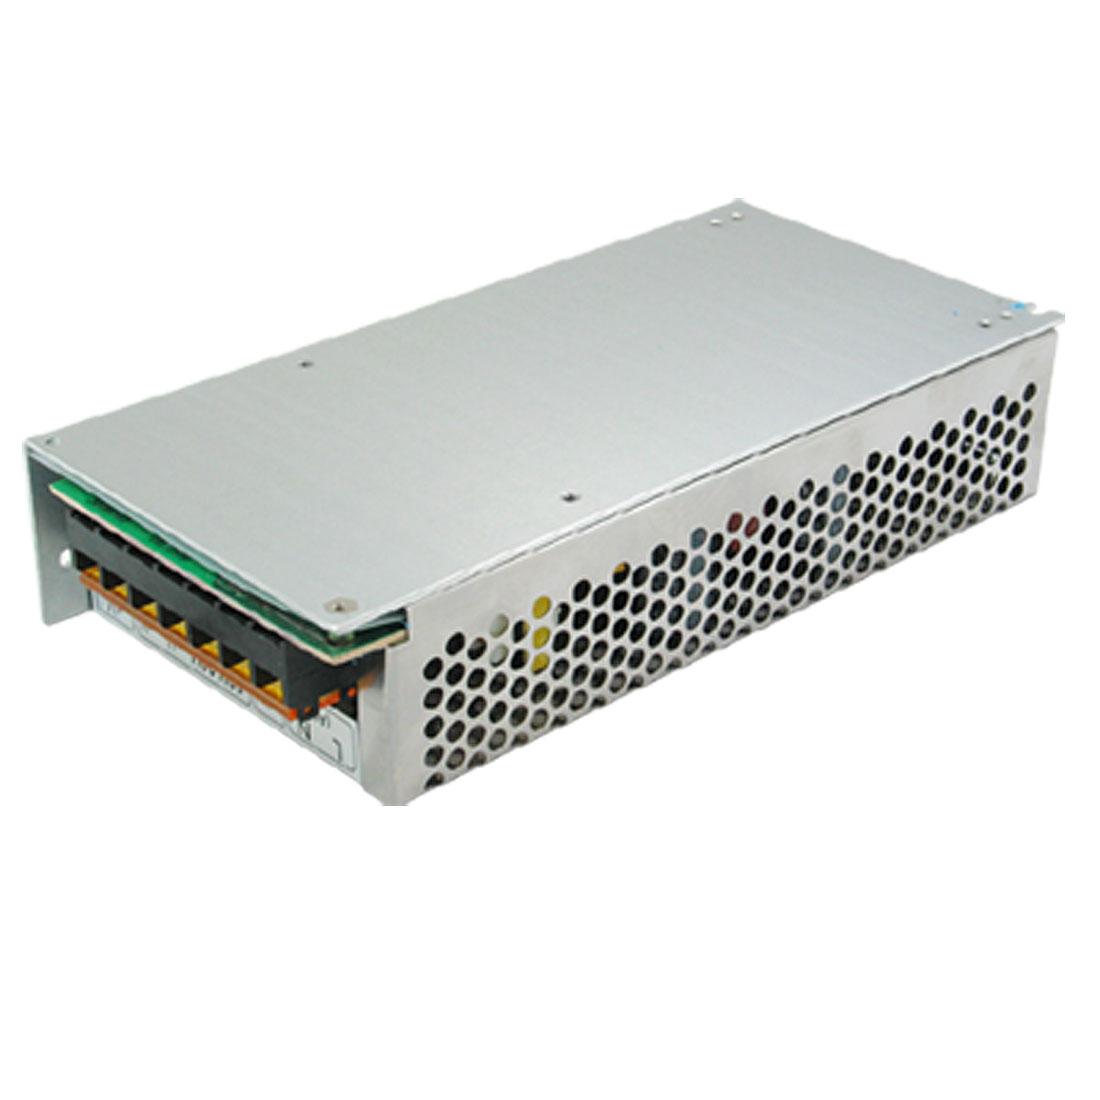 AC 110/220V DC 12V 15A 180W Switching Power Supply Driver Converter for LED Strip Light CCTV